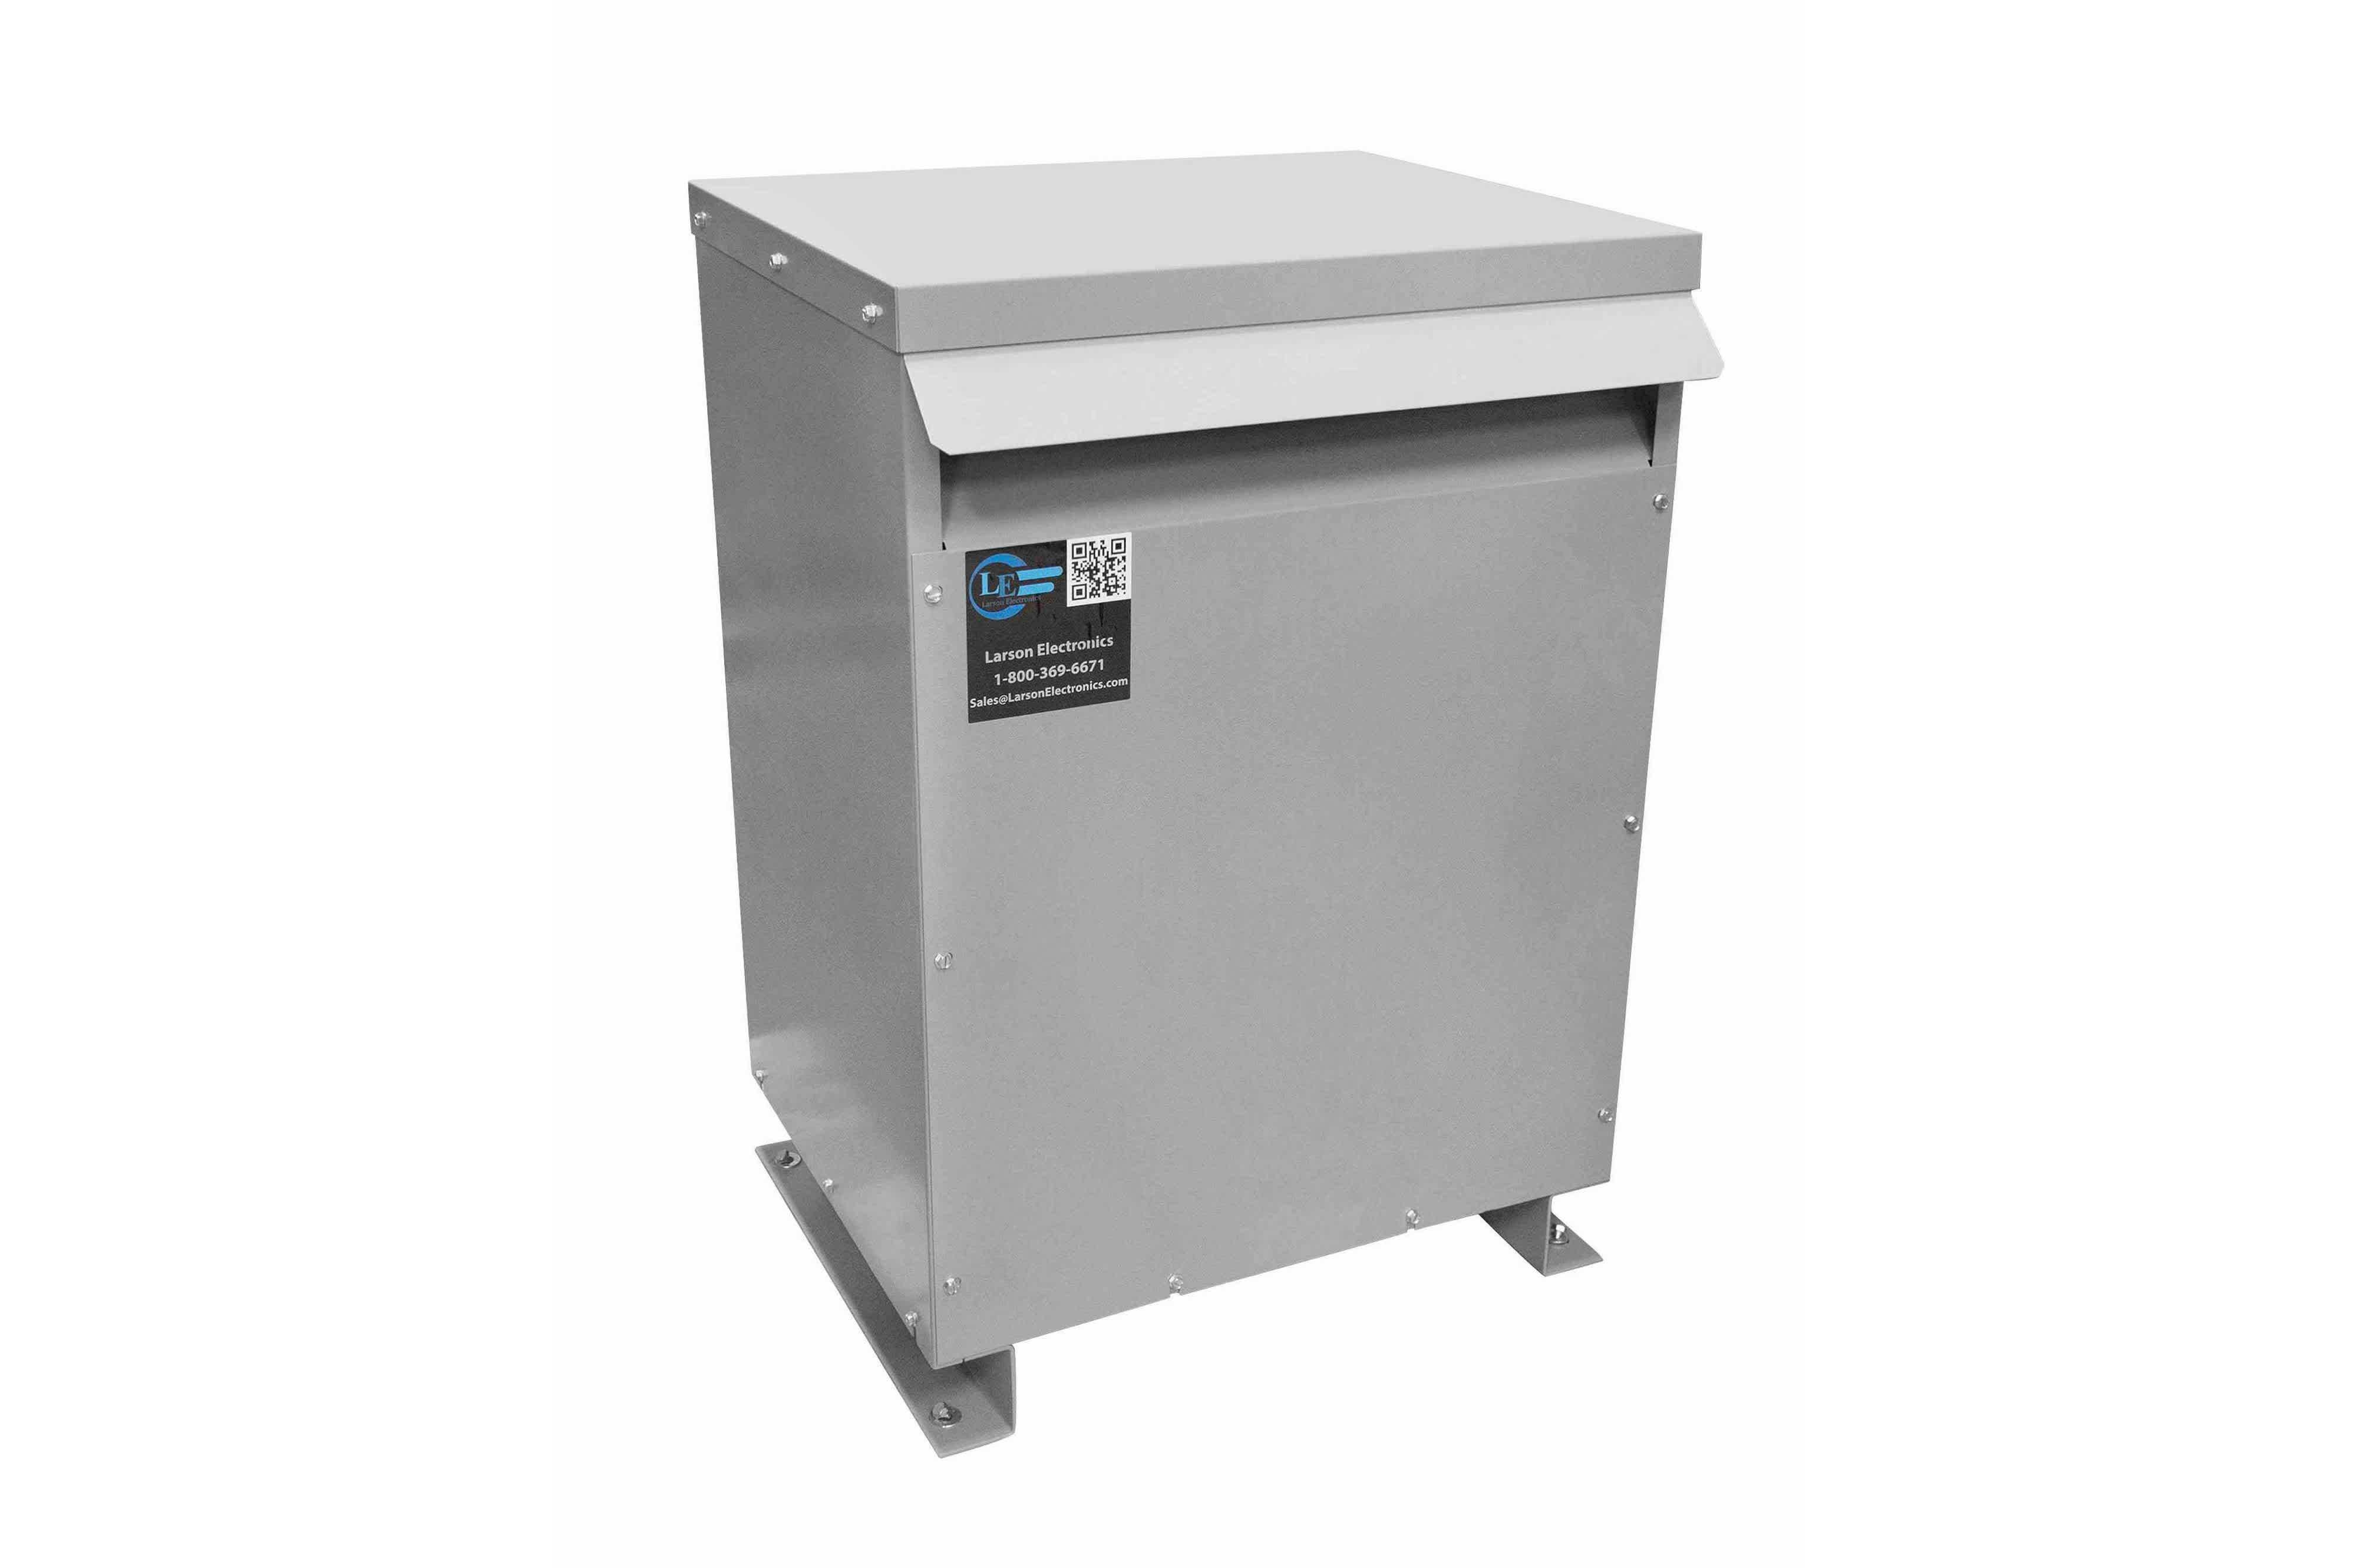 75 kVA 3PH Isolation Transformer, 208V Wye Primary, 600V Delta Secondary, N3R, Ventilated, 60 Hz